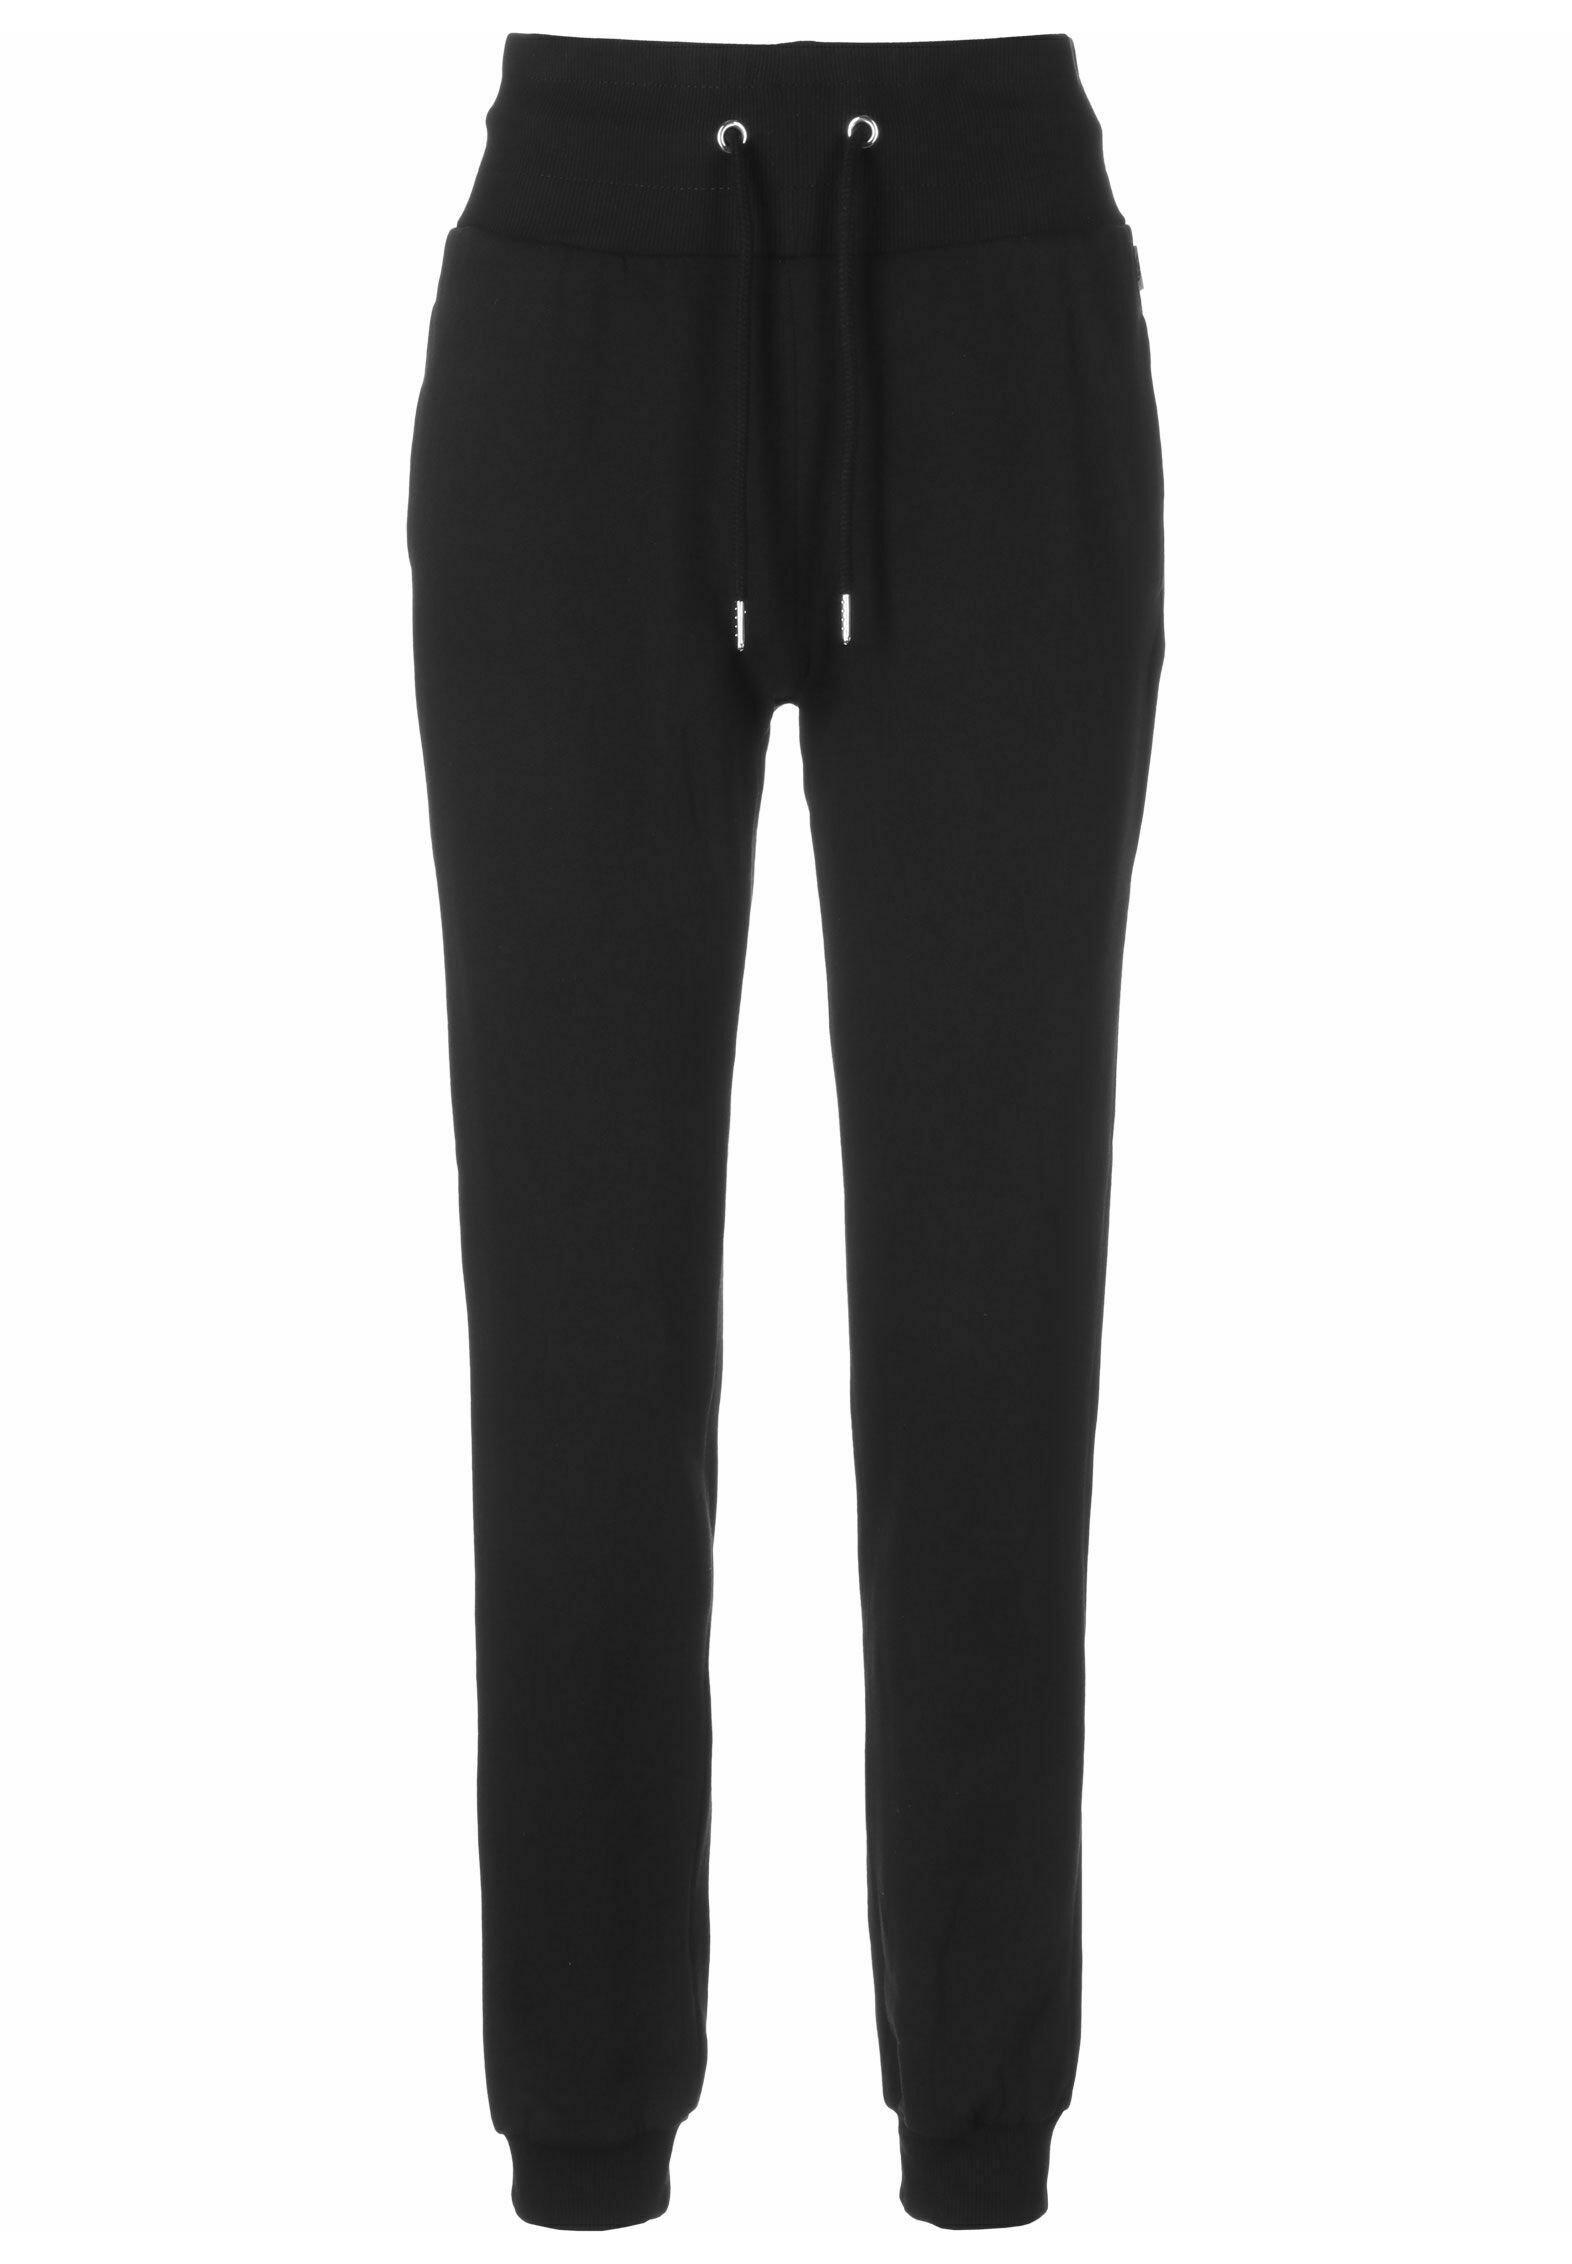 Mujer HIGH WAIST - Pantalones deportivos